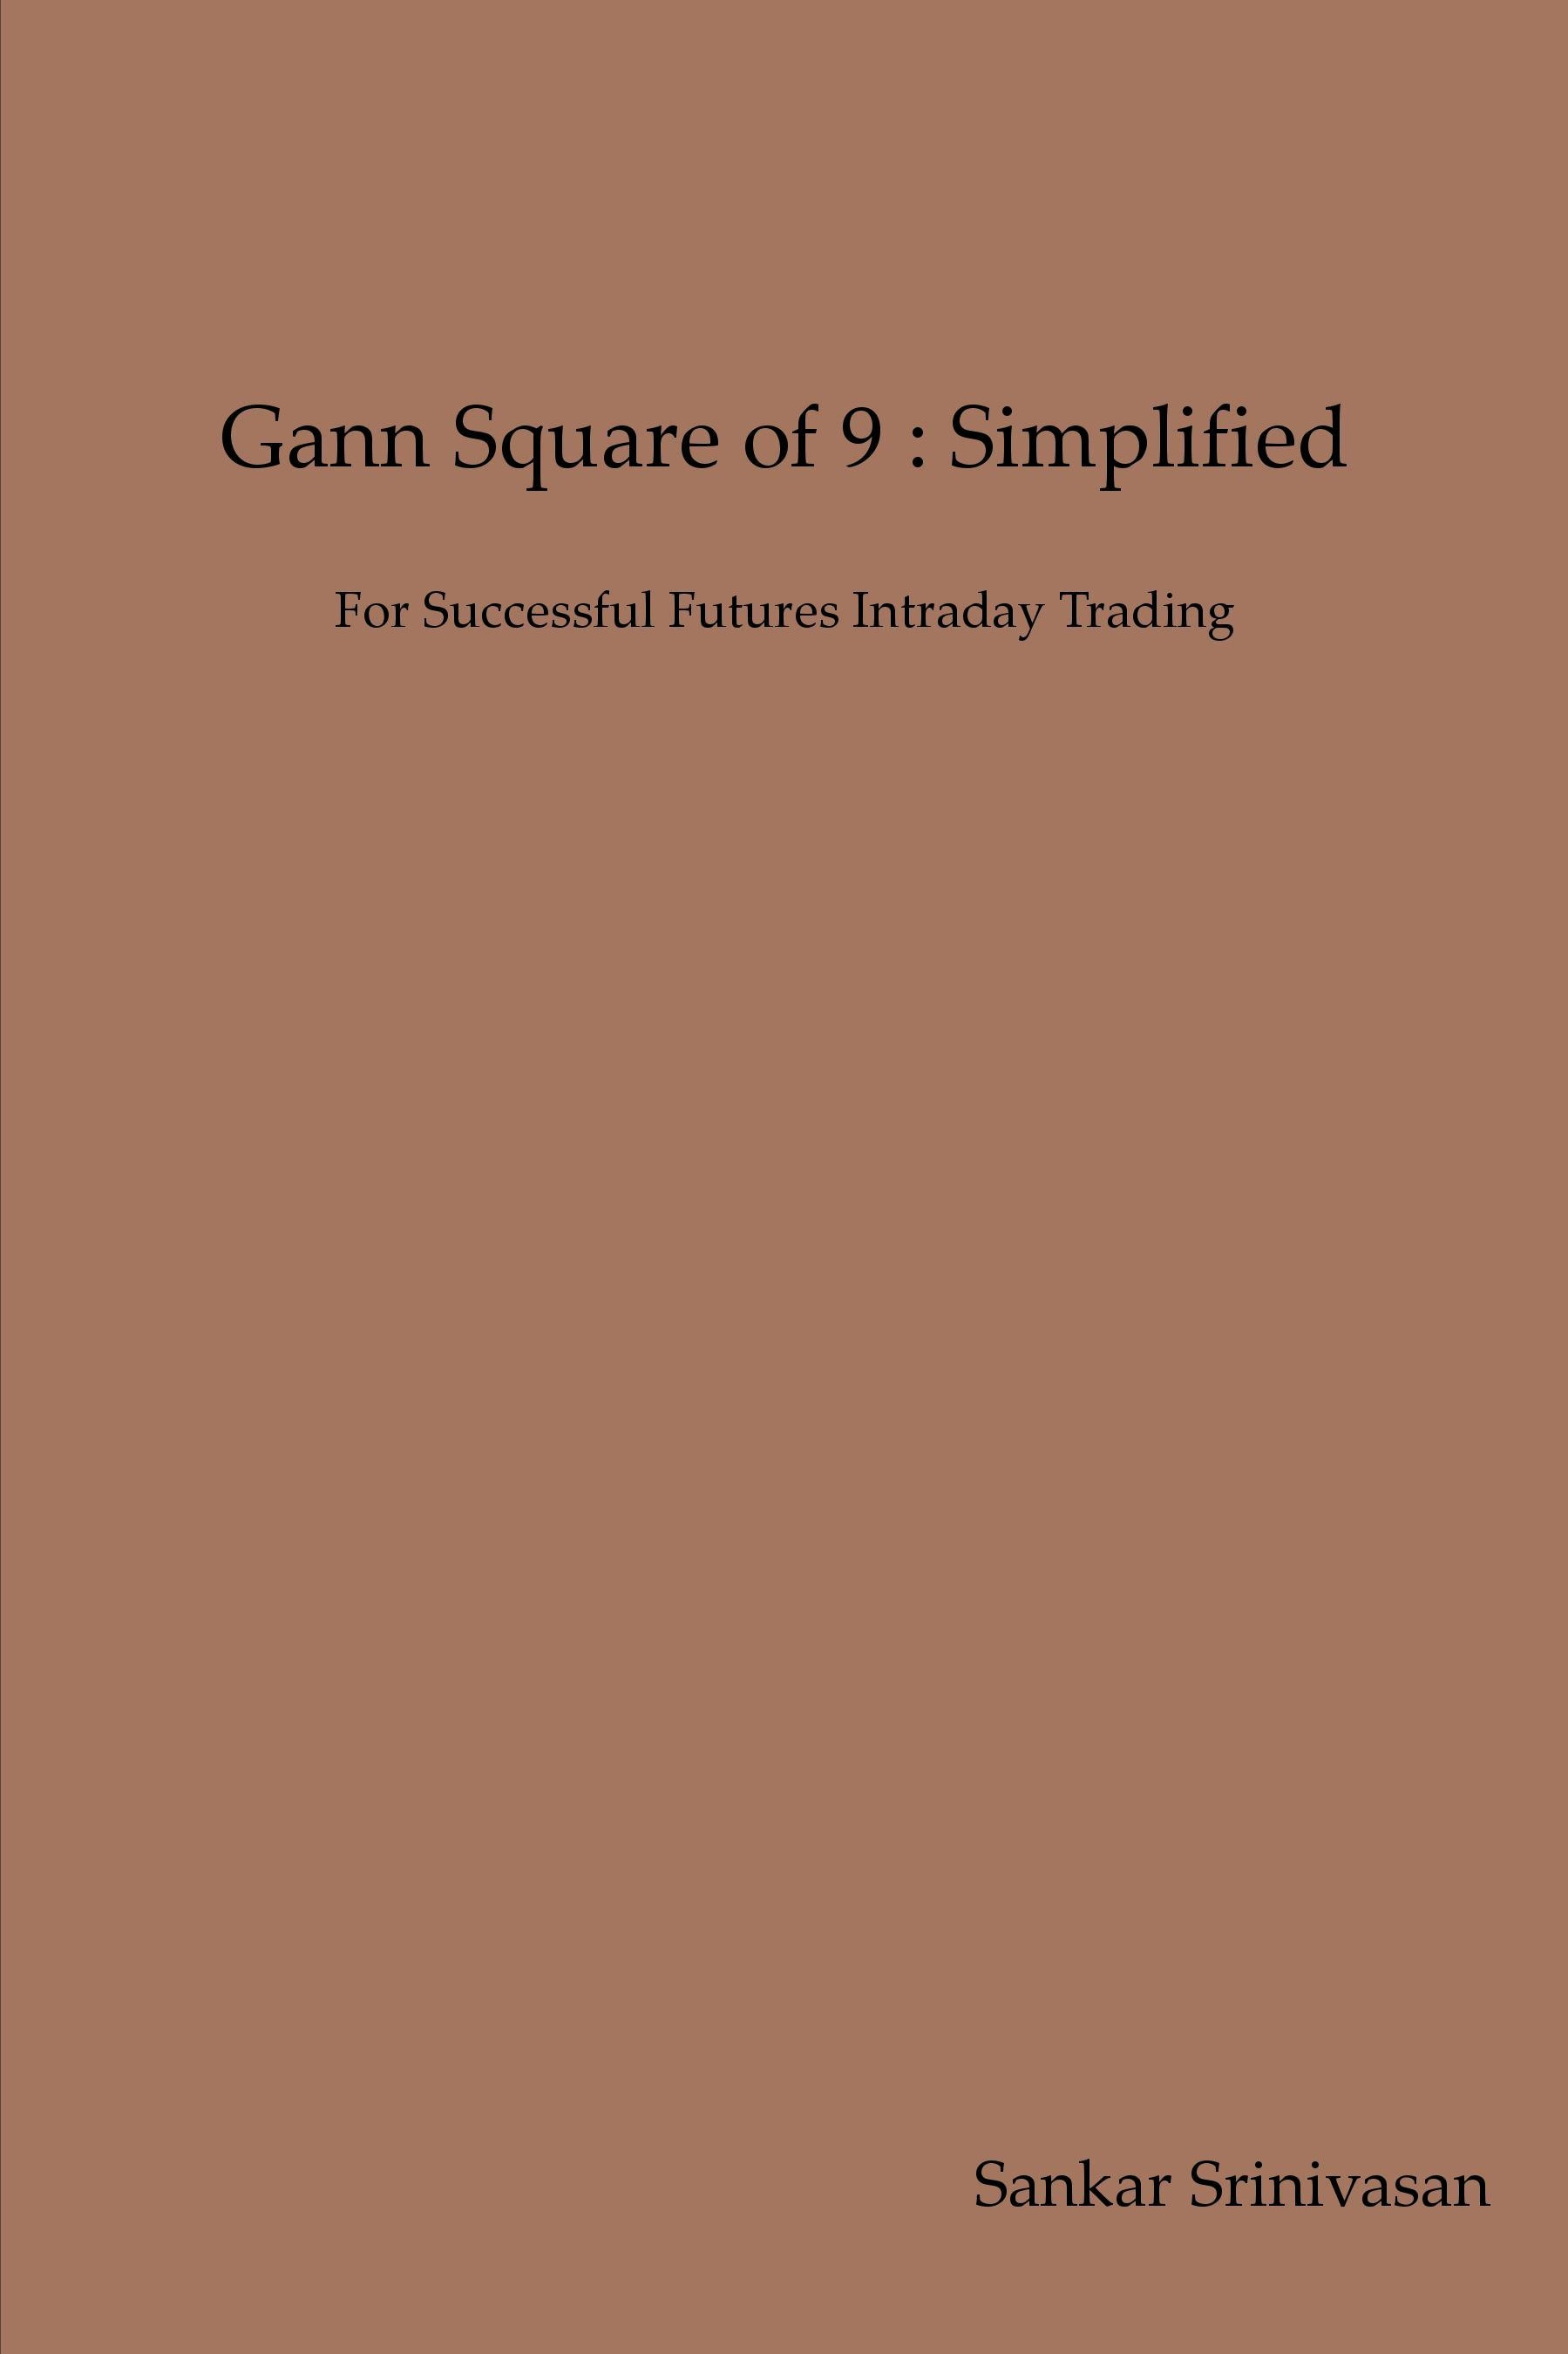 Gann Square of 9 : Simplified | Pothi com